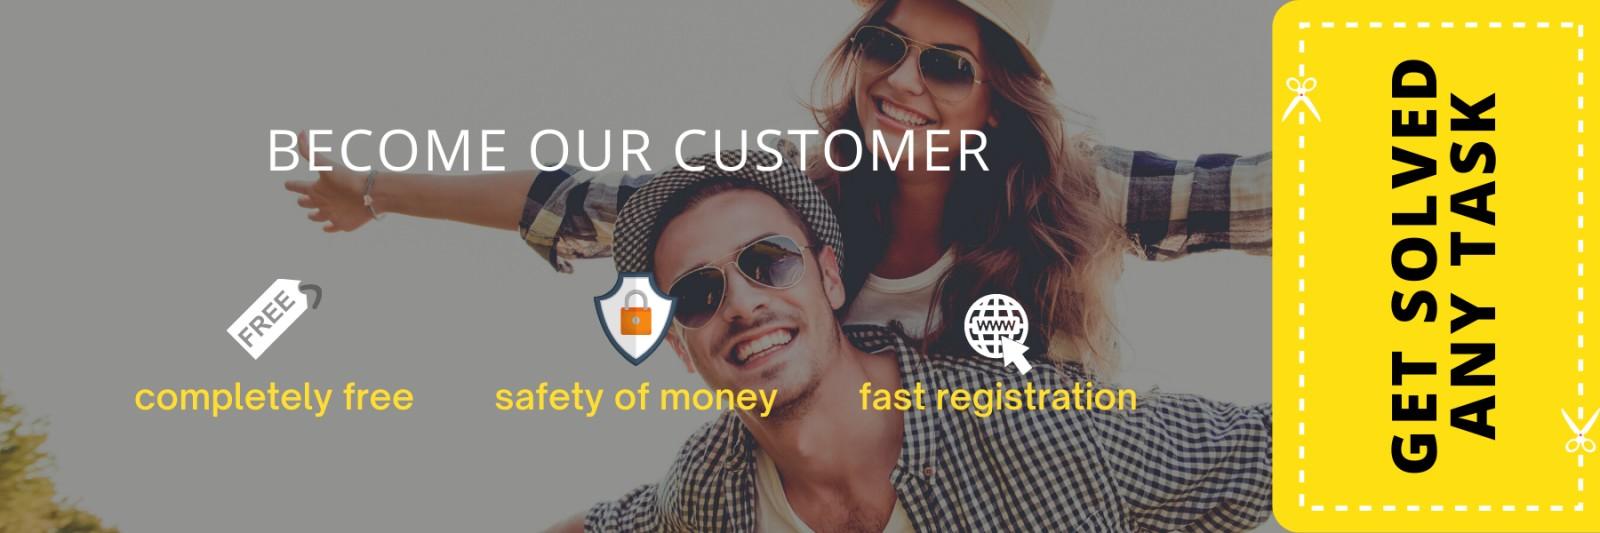 Fee4Bee customer benefits